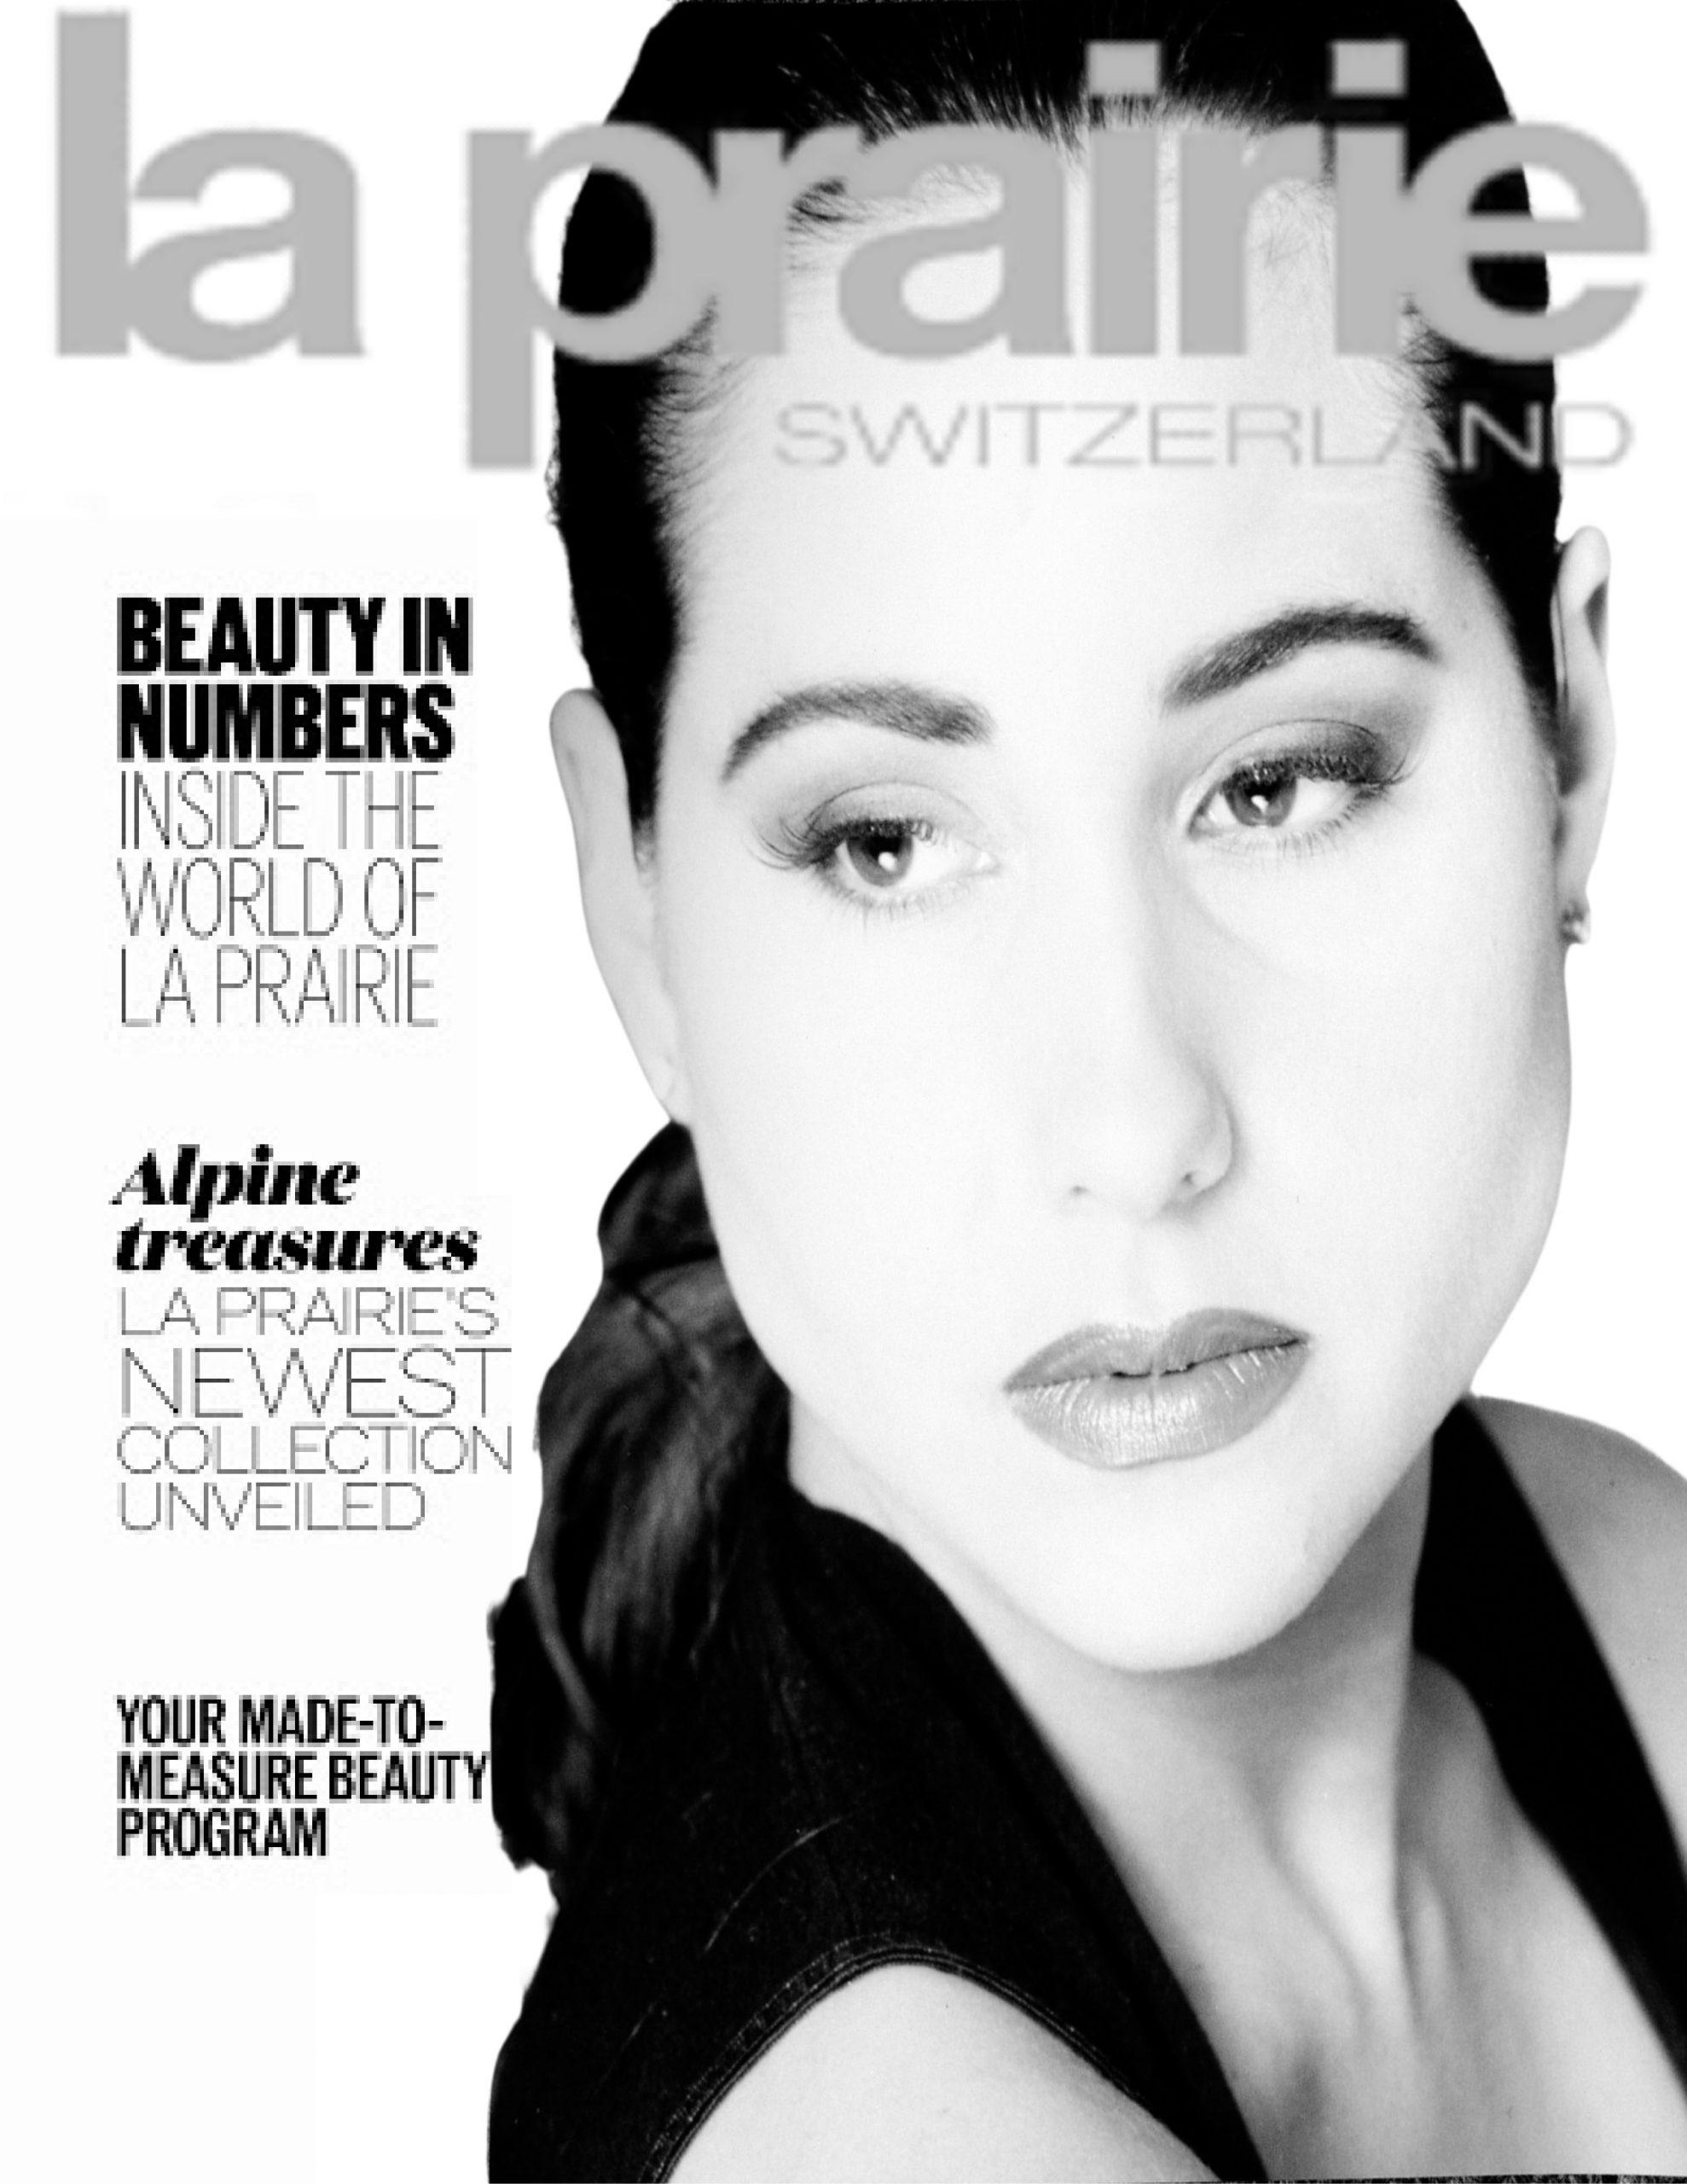 annlauren,beauty,laprairie,editorial, model, actress, imdb, ann, lauren,